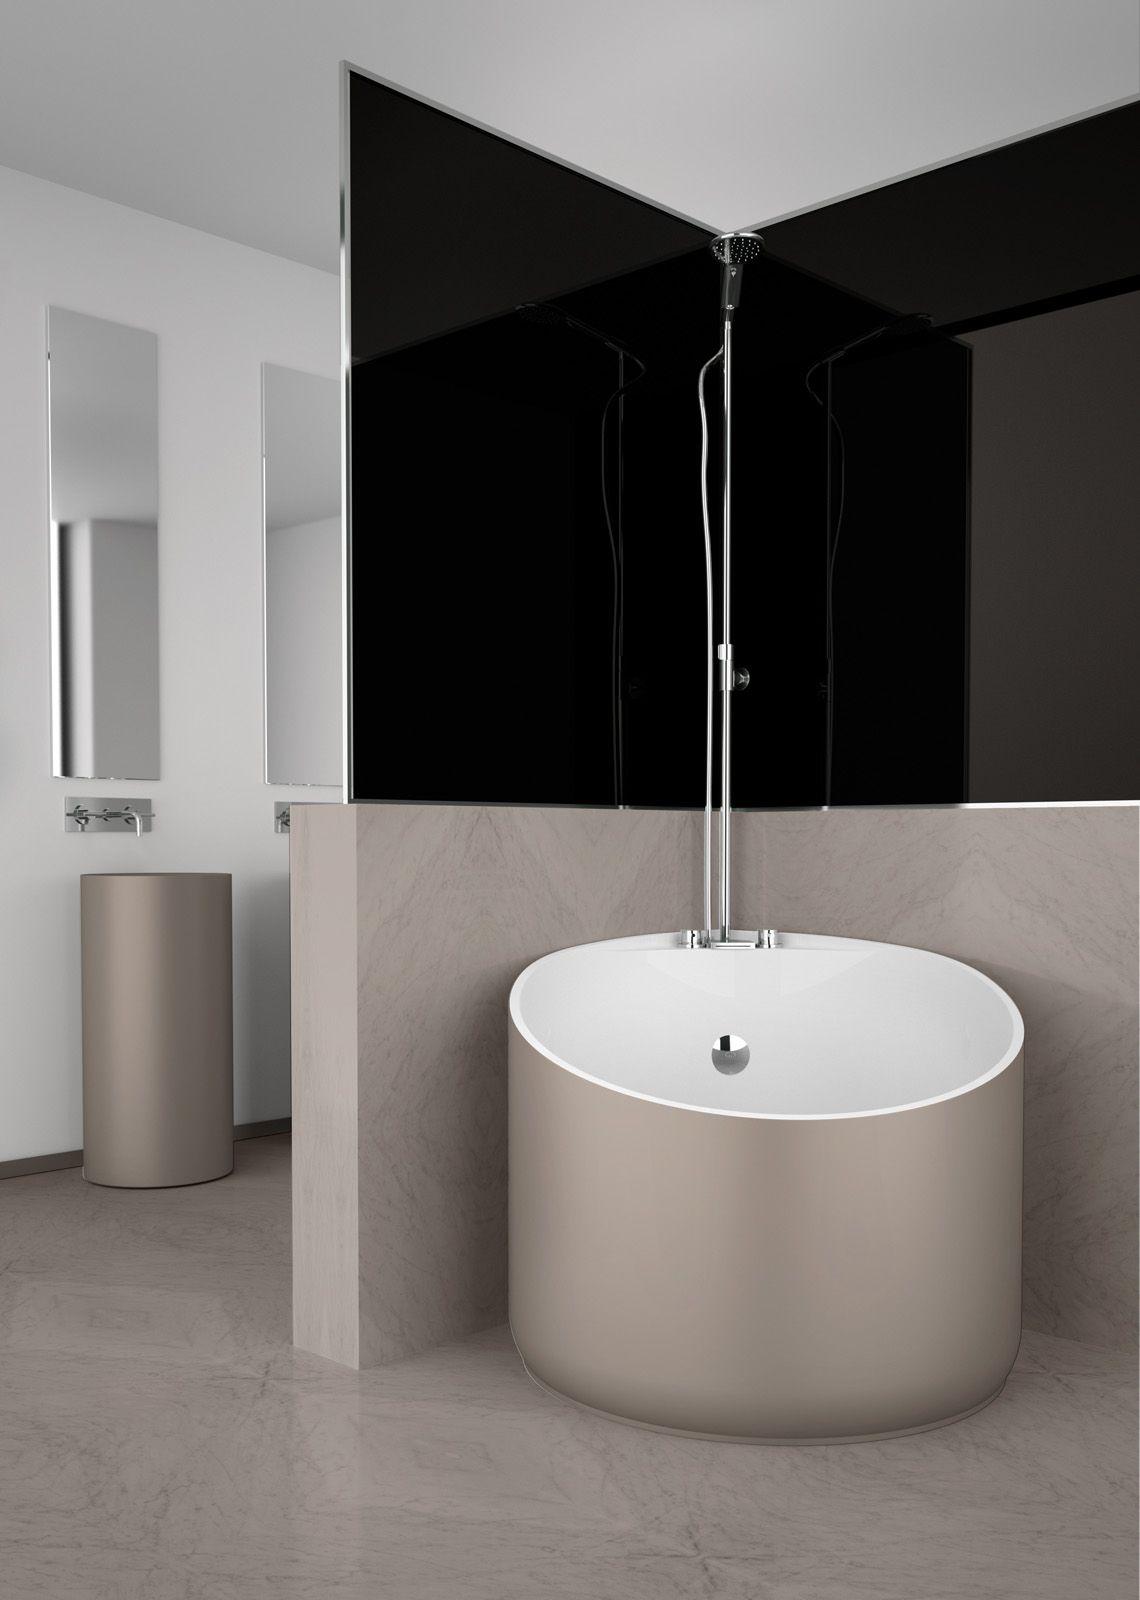 Mini #bathtub by #GlassDesign in 8 finishes including tortora (shown ...